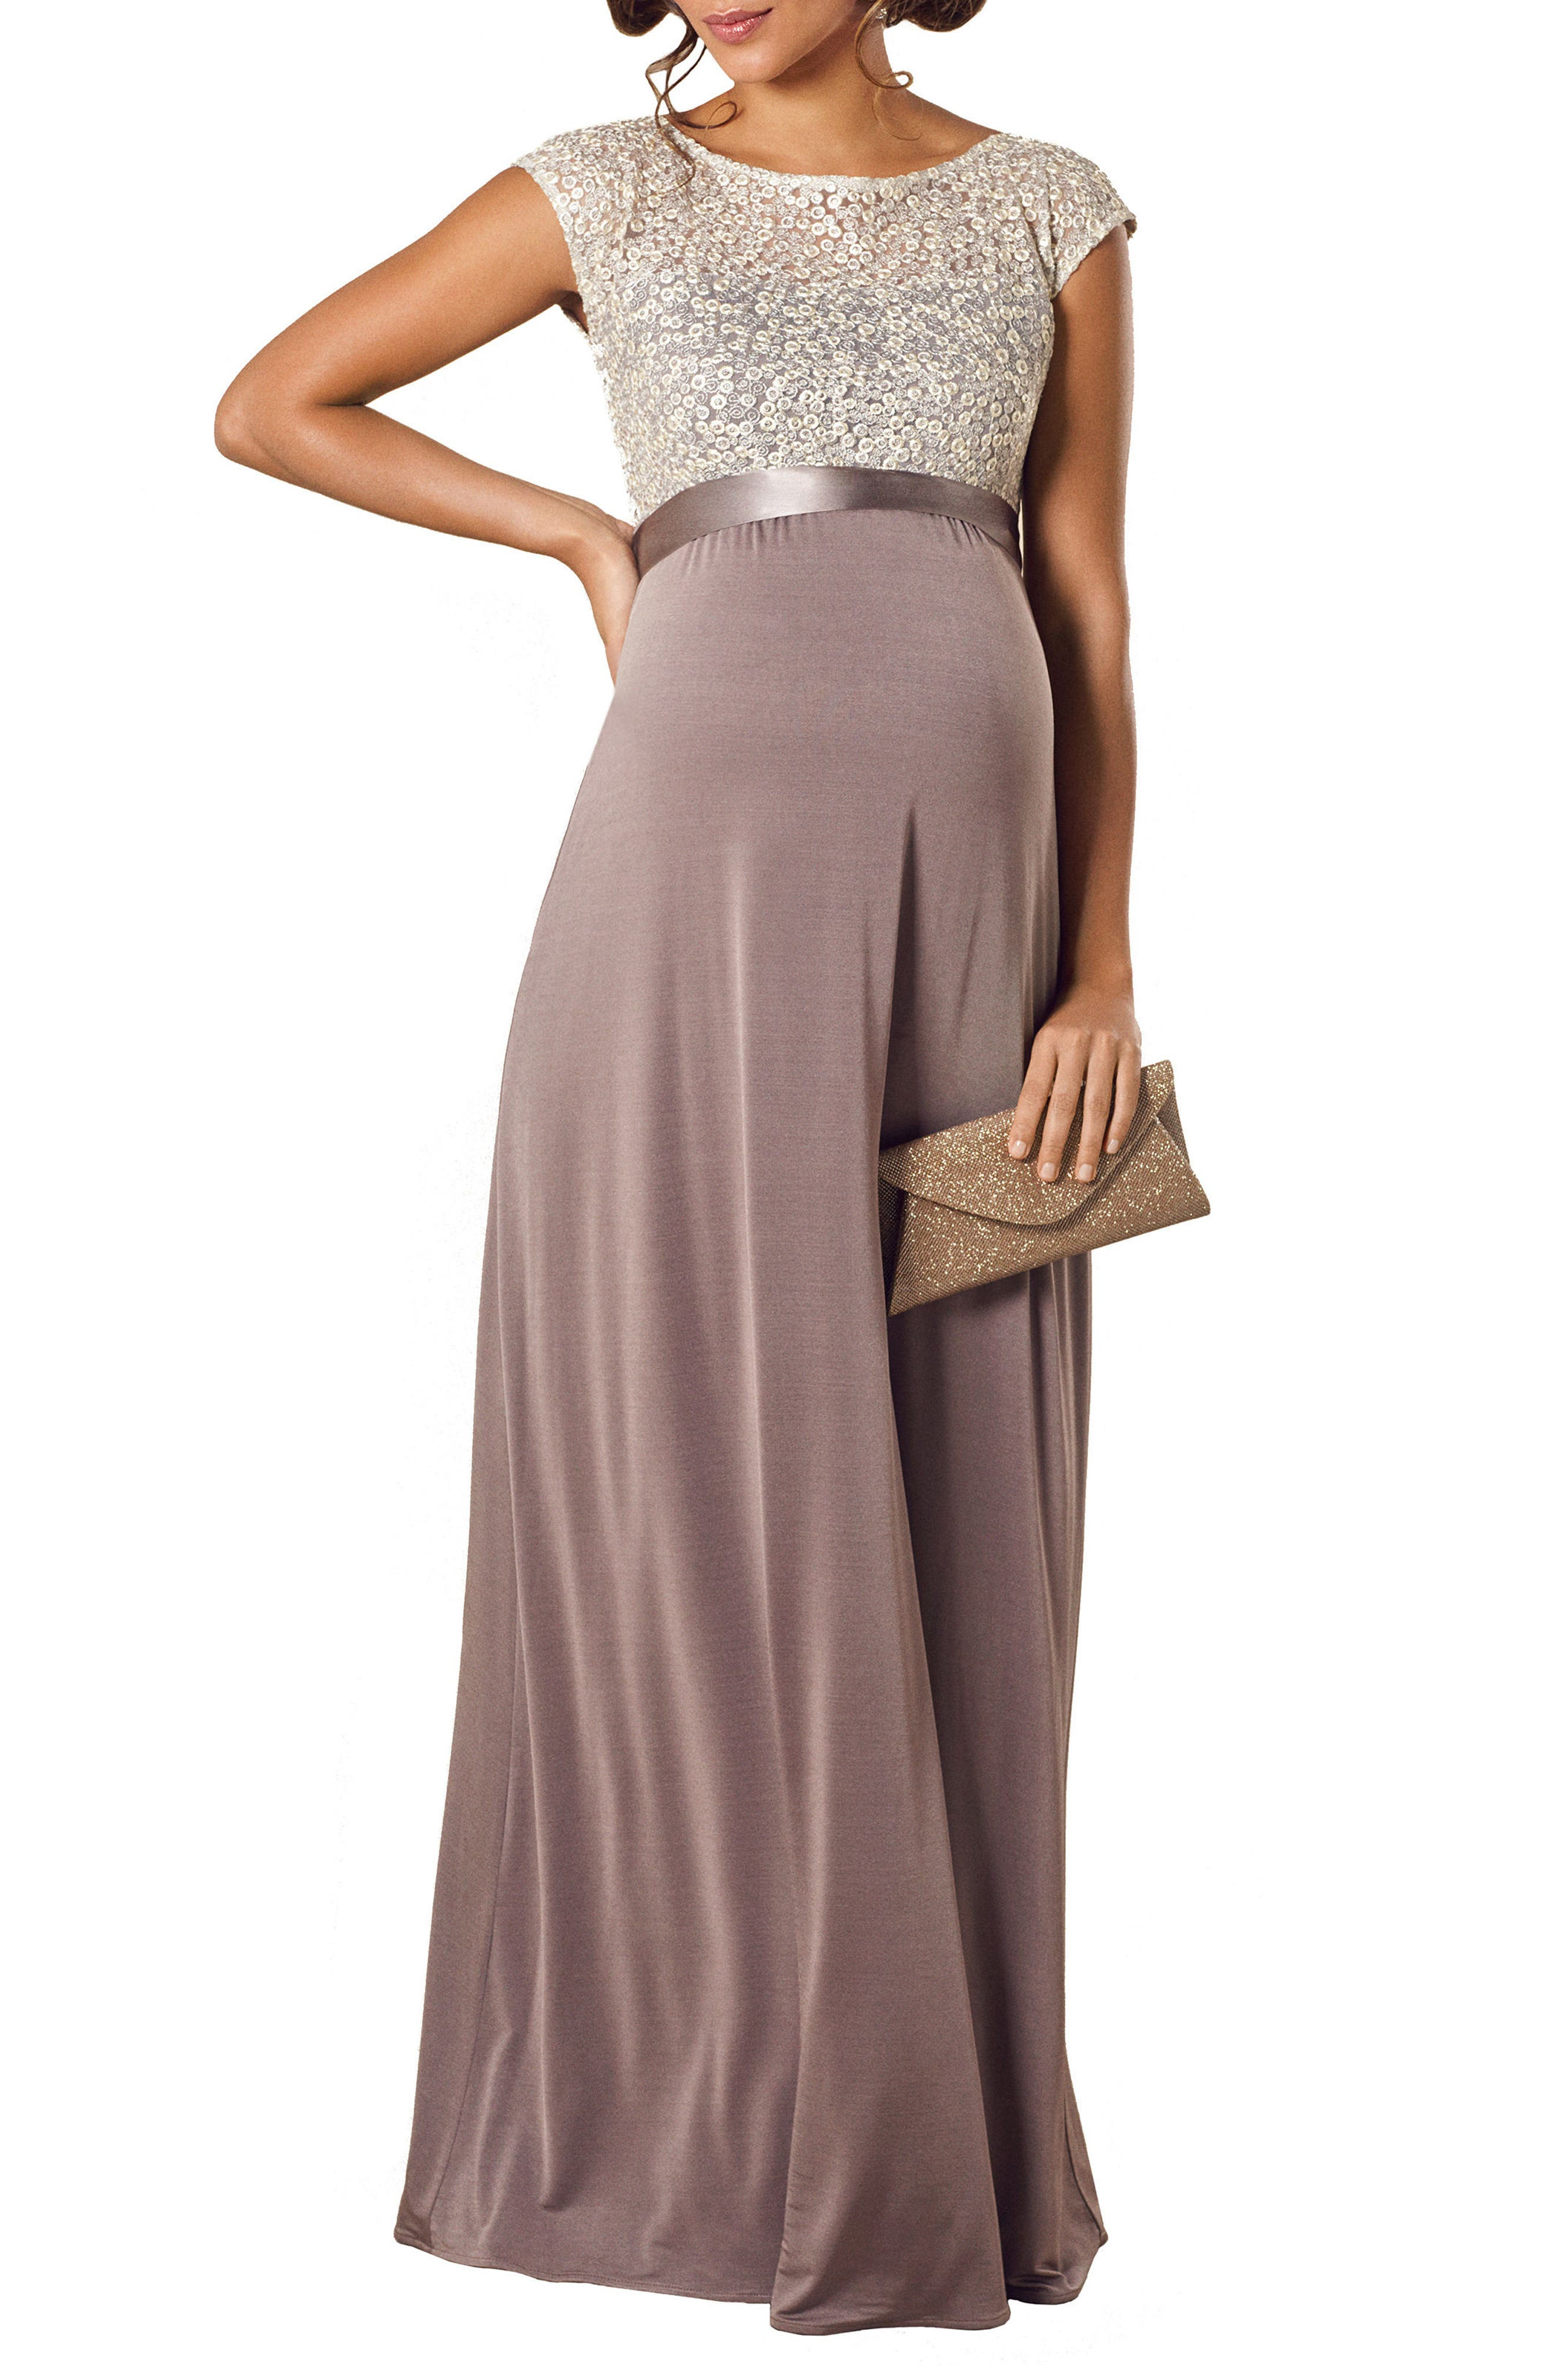 Tiffany Rose Mia Maternity Gown, Grey